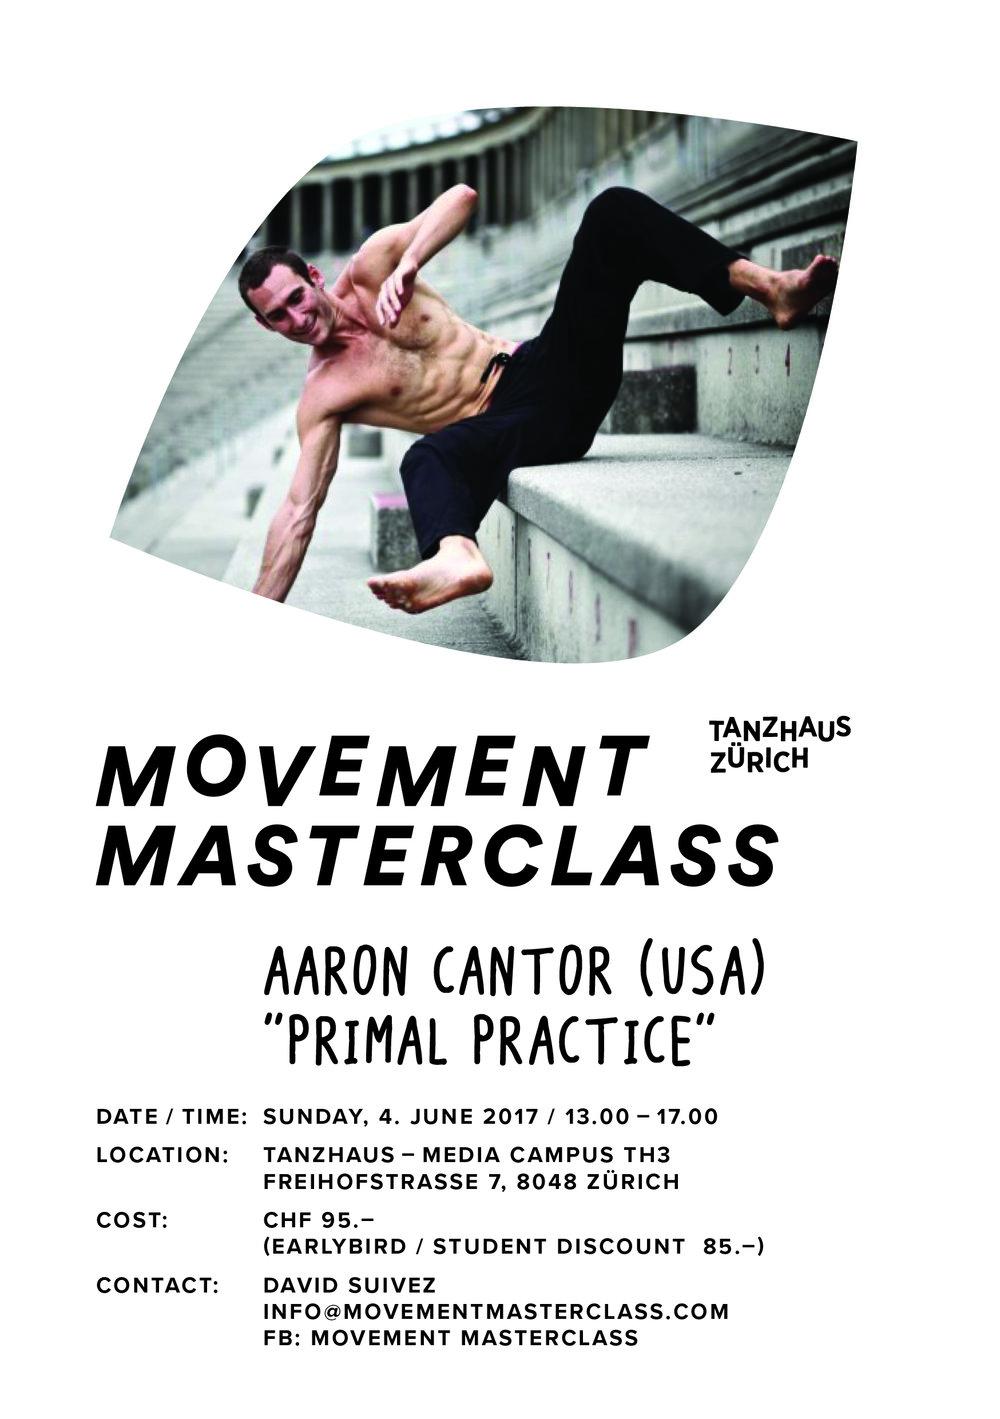 Aaron-Cantor-600x400.jpg